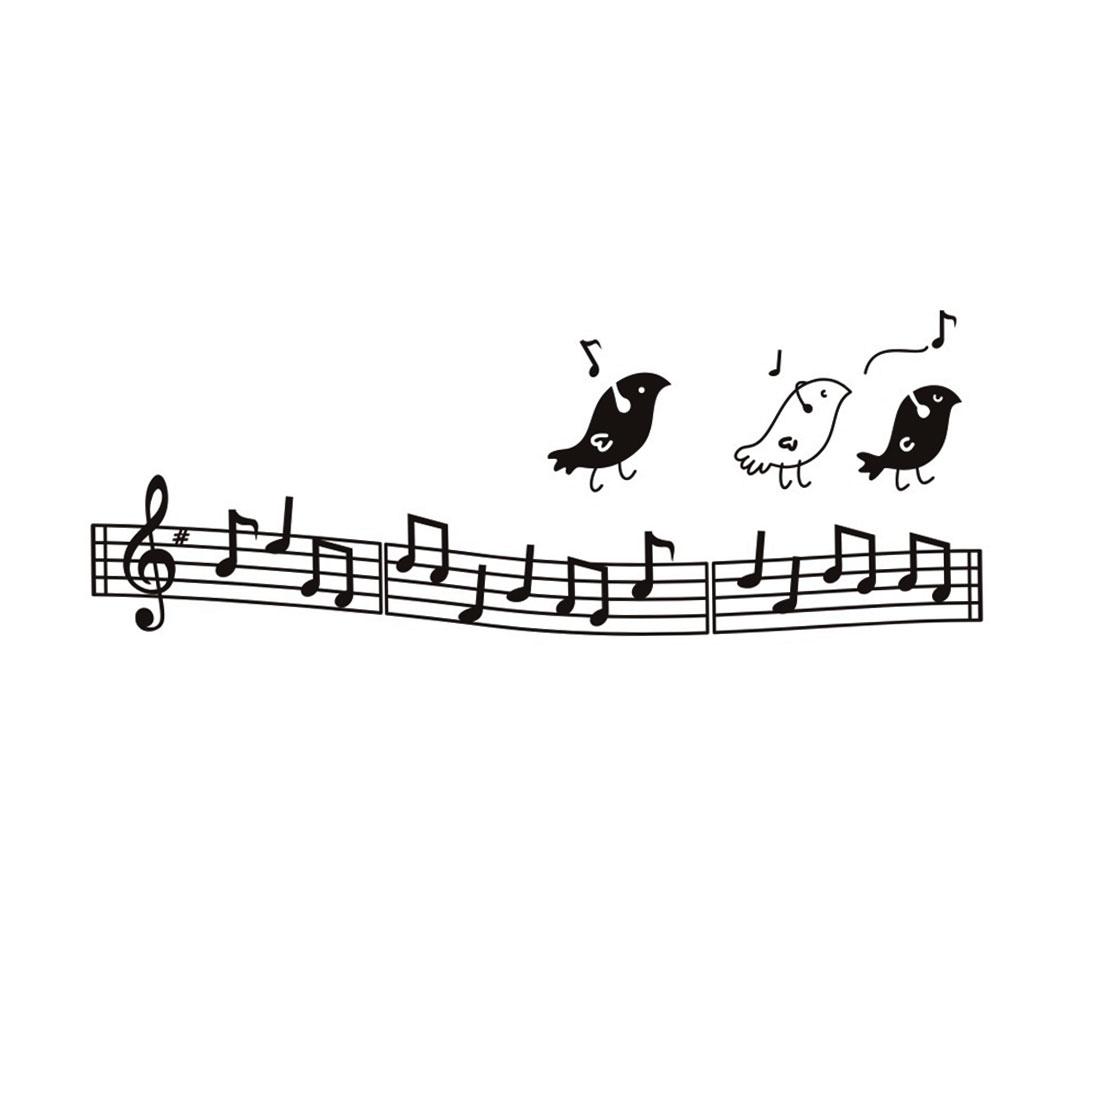 Music Score Birds Pattern Black Wall Sticker Room Art Decal Mural Decor 44x58cm